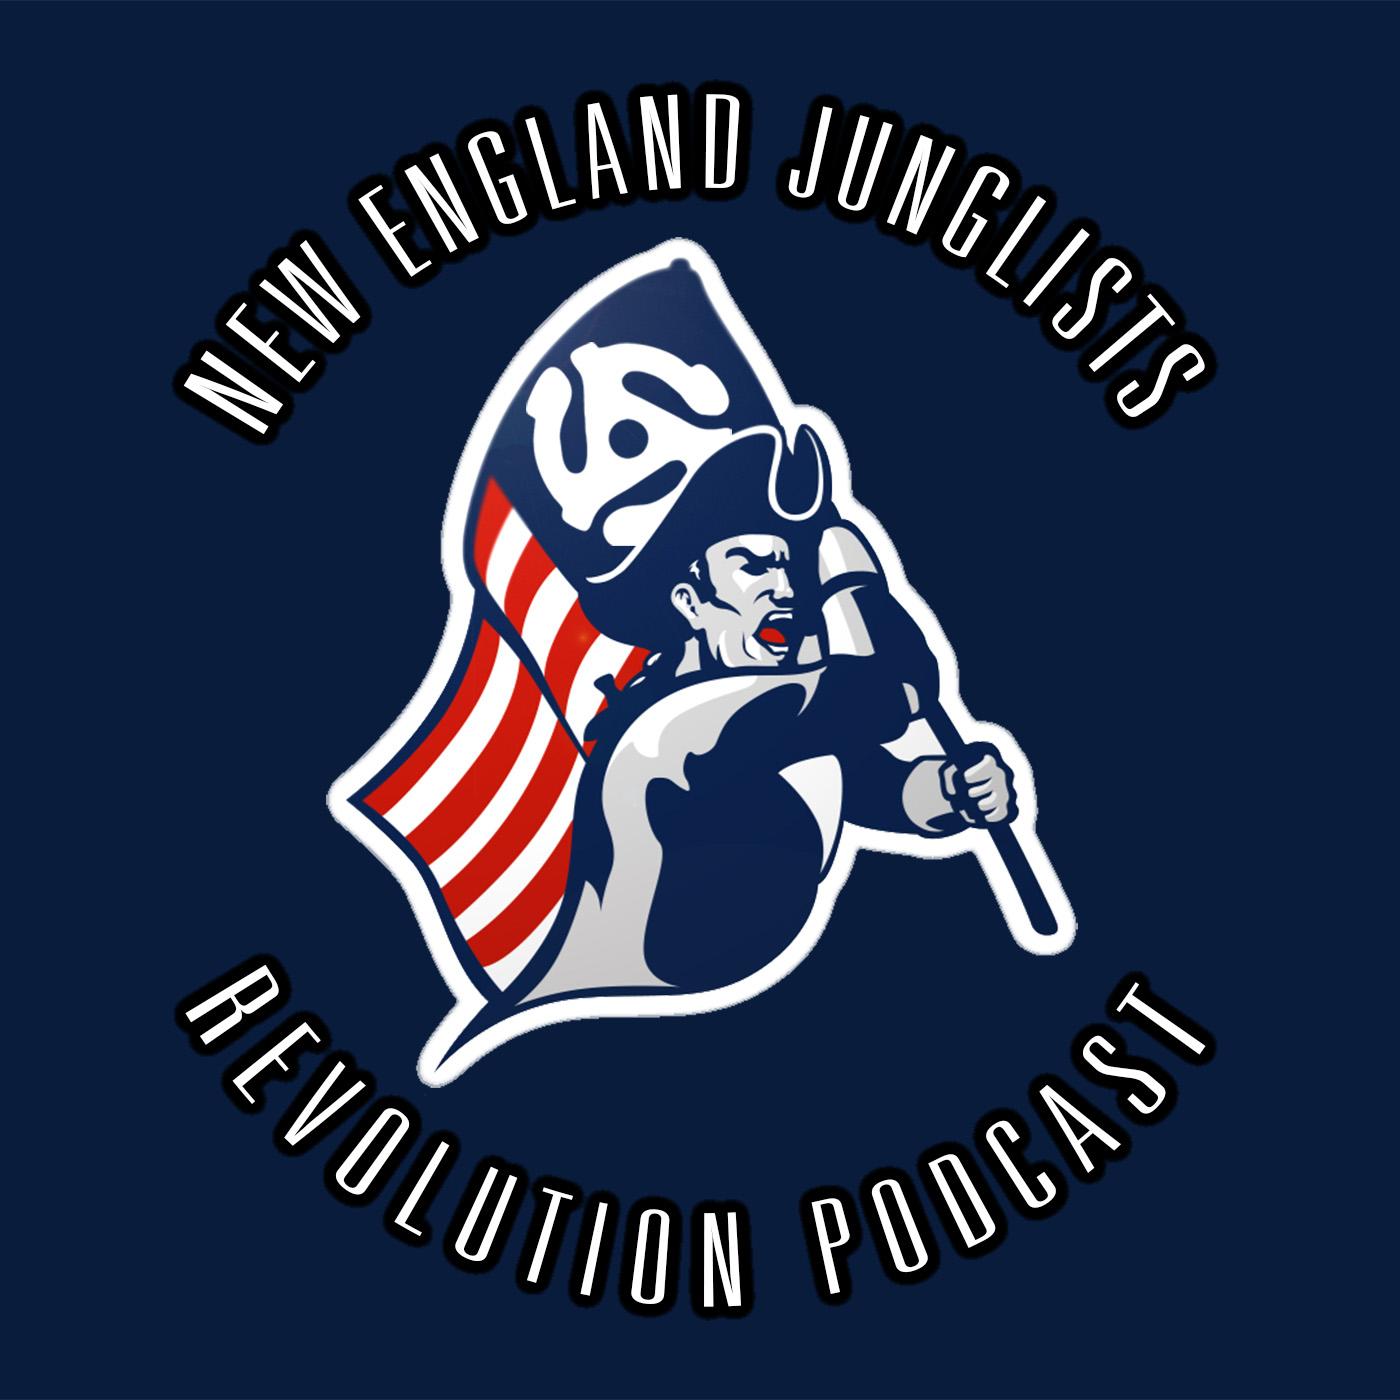 New England Junglists REVOLUTION Podcast